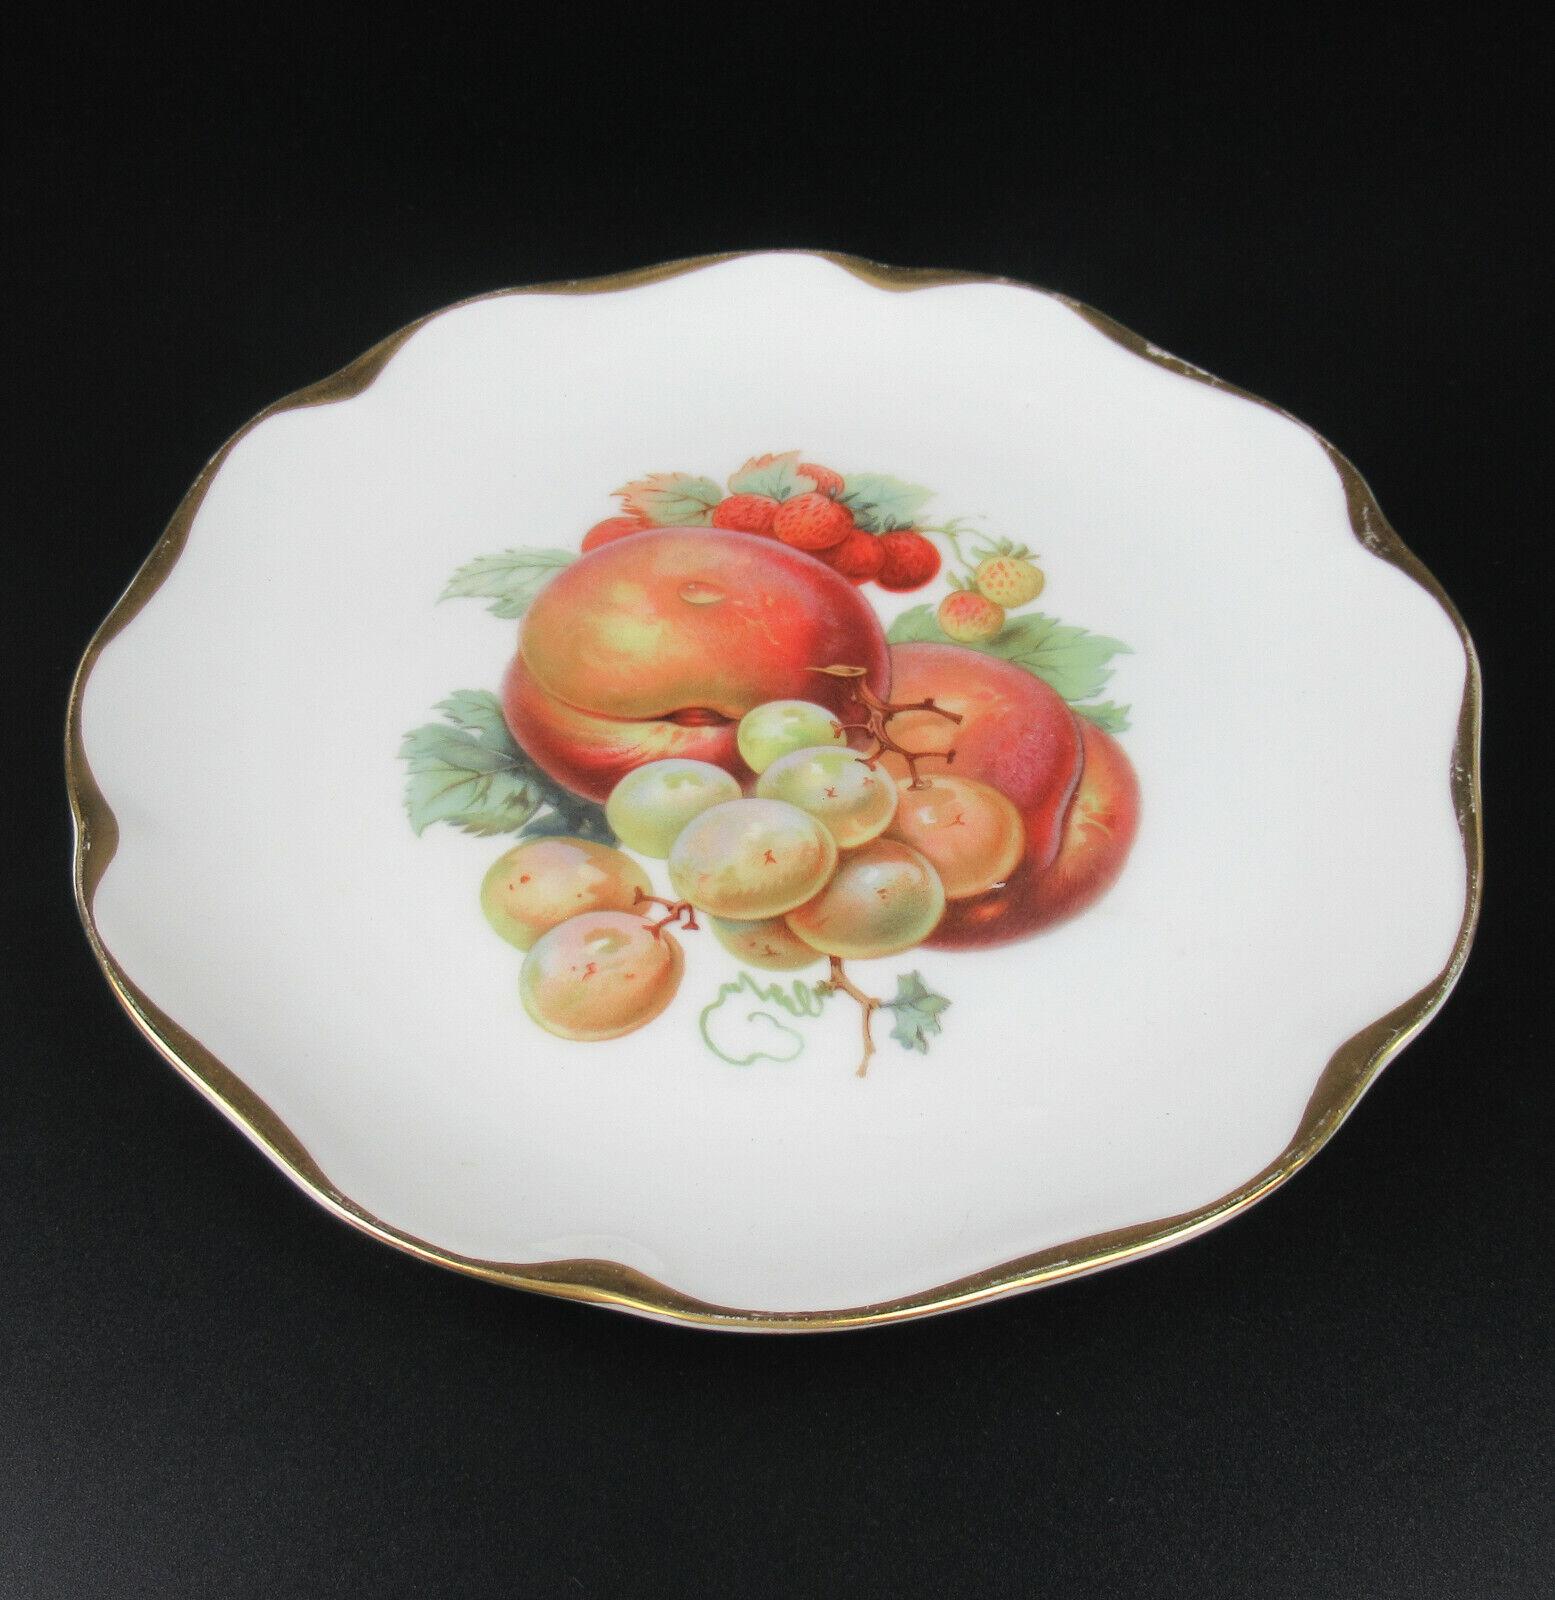 Rosenthal Maria Kuchenteller Goldrand Obst Dekor Variante I